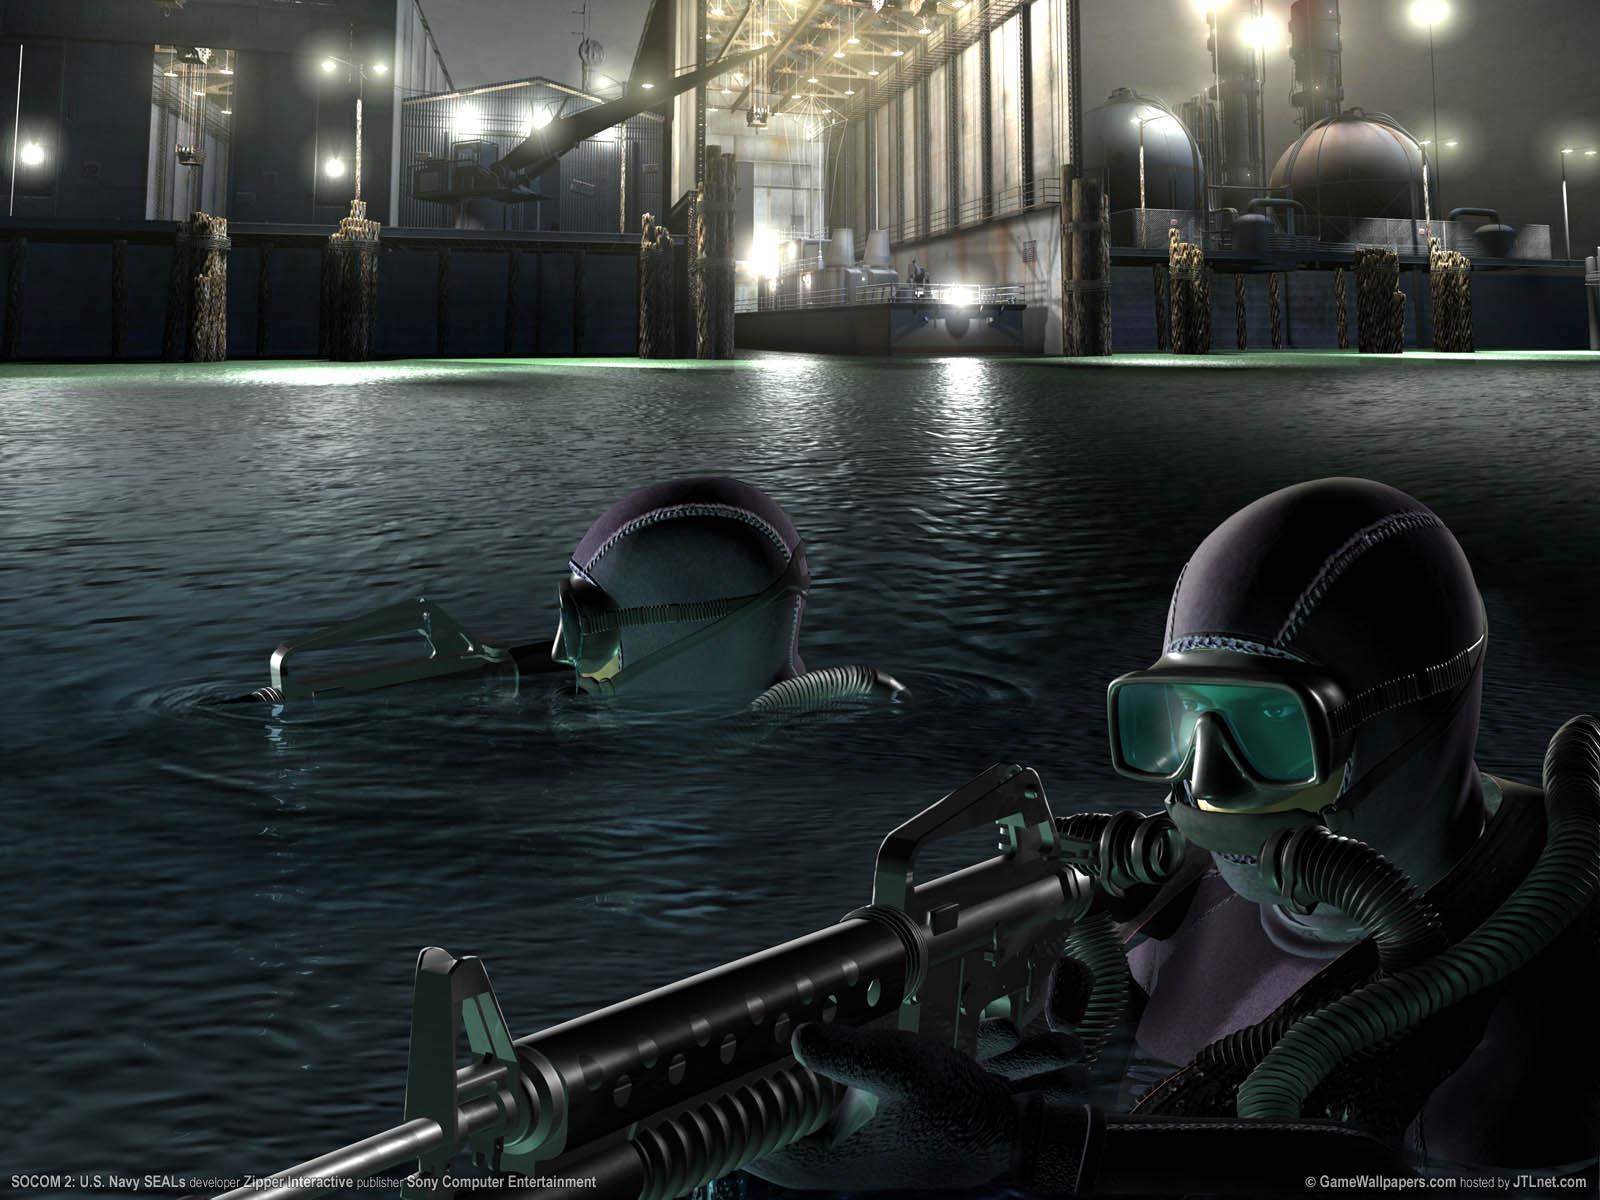 Socom 2 us navy seals wallpaper 03 1600x1200 altavistaventures Choice Image